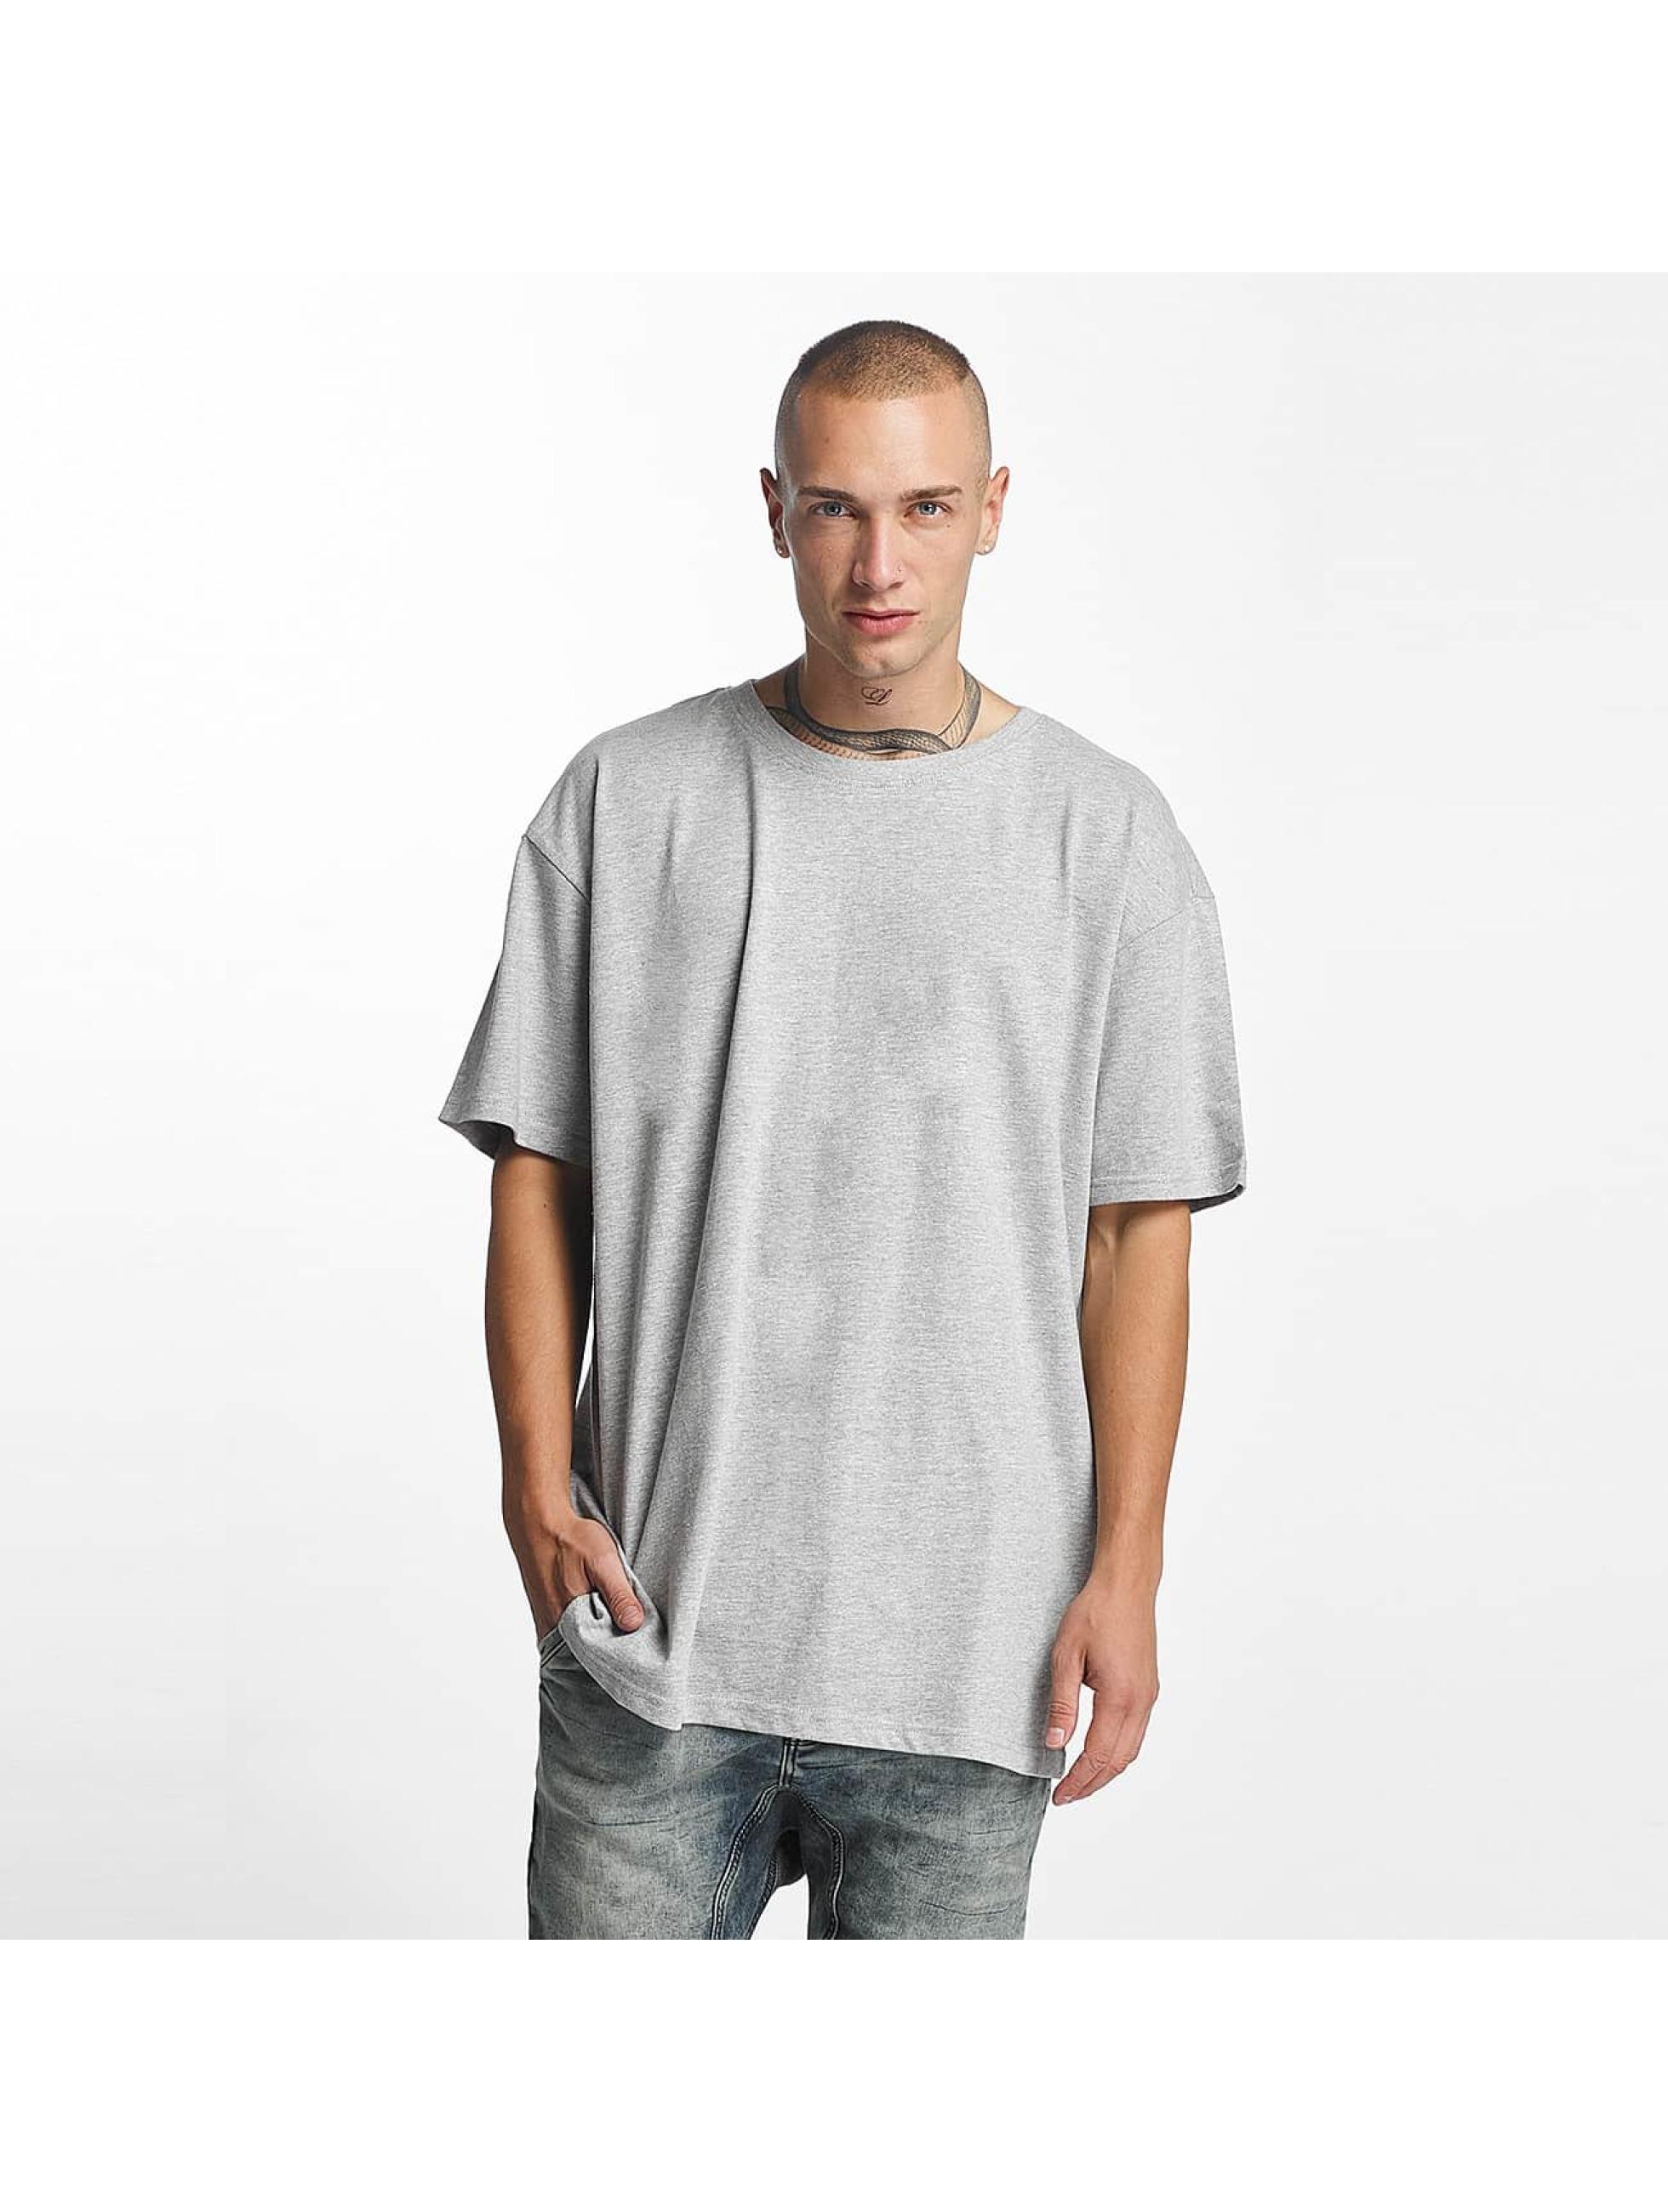 Urban Classics Männer T-Shirt Heavy Oversized in grau